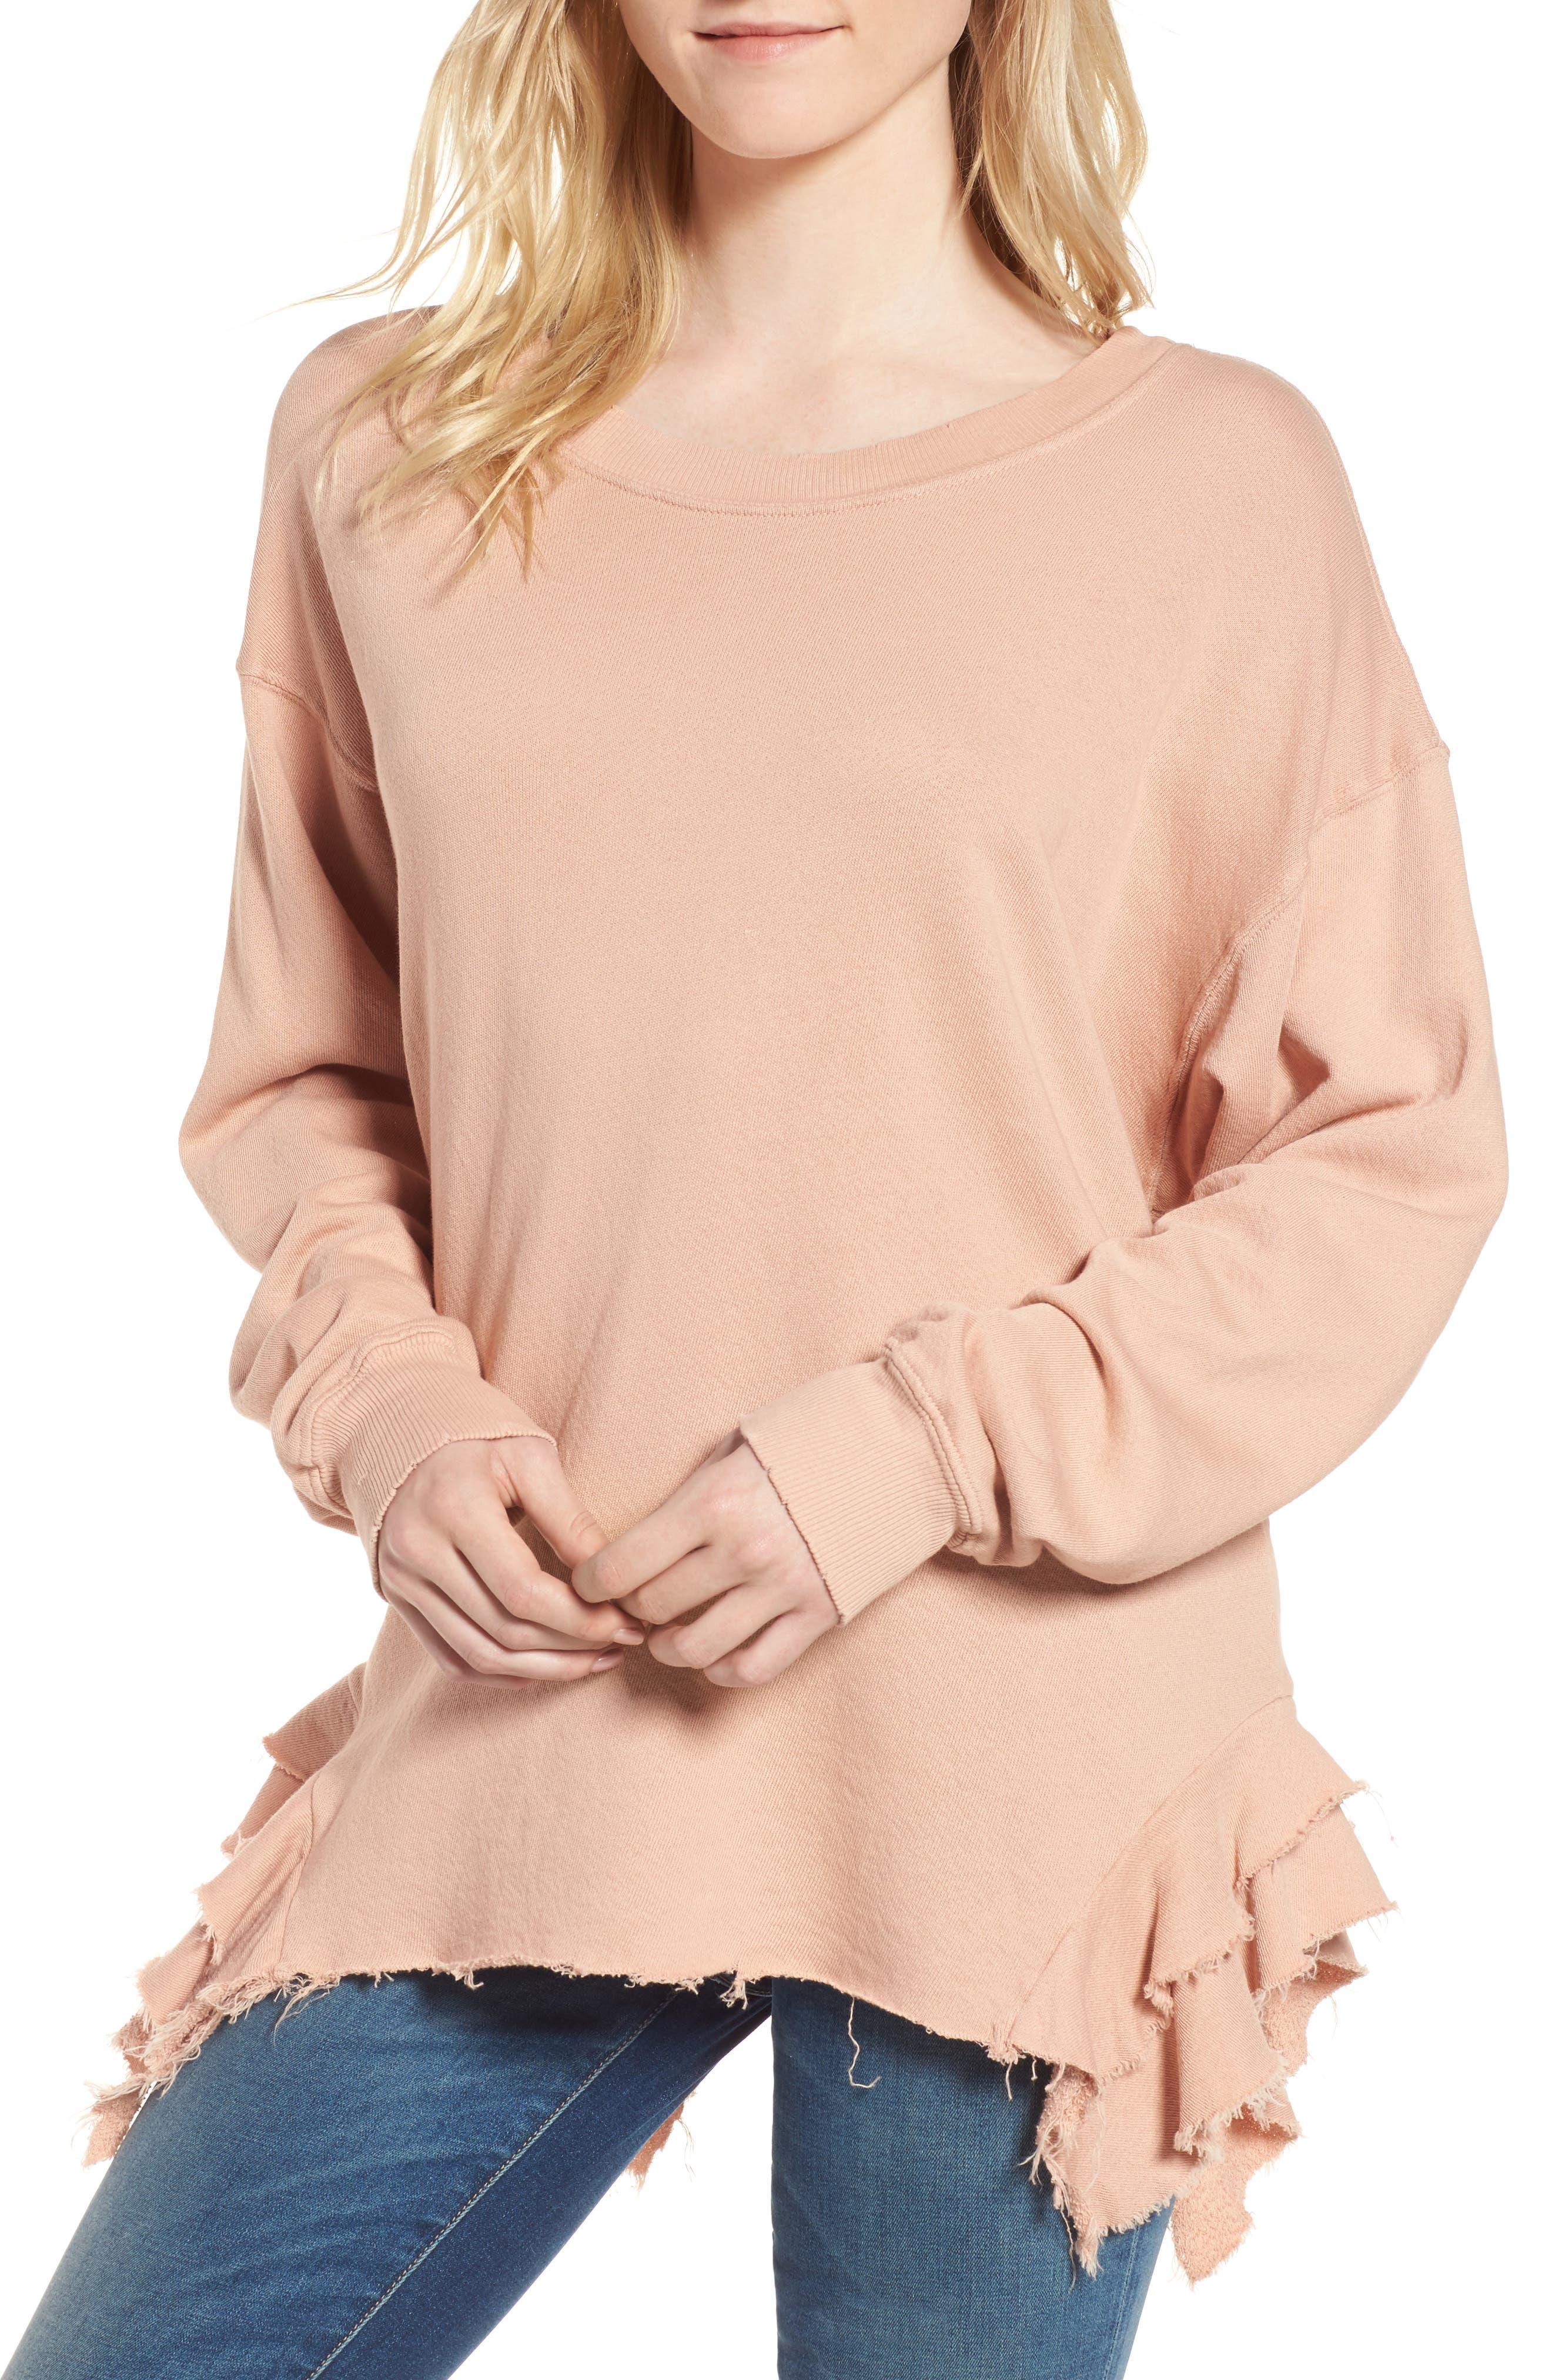 Alternate Image 1 Selected - Current/Elliott The Slouchy Ruffle Sweatshirt